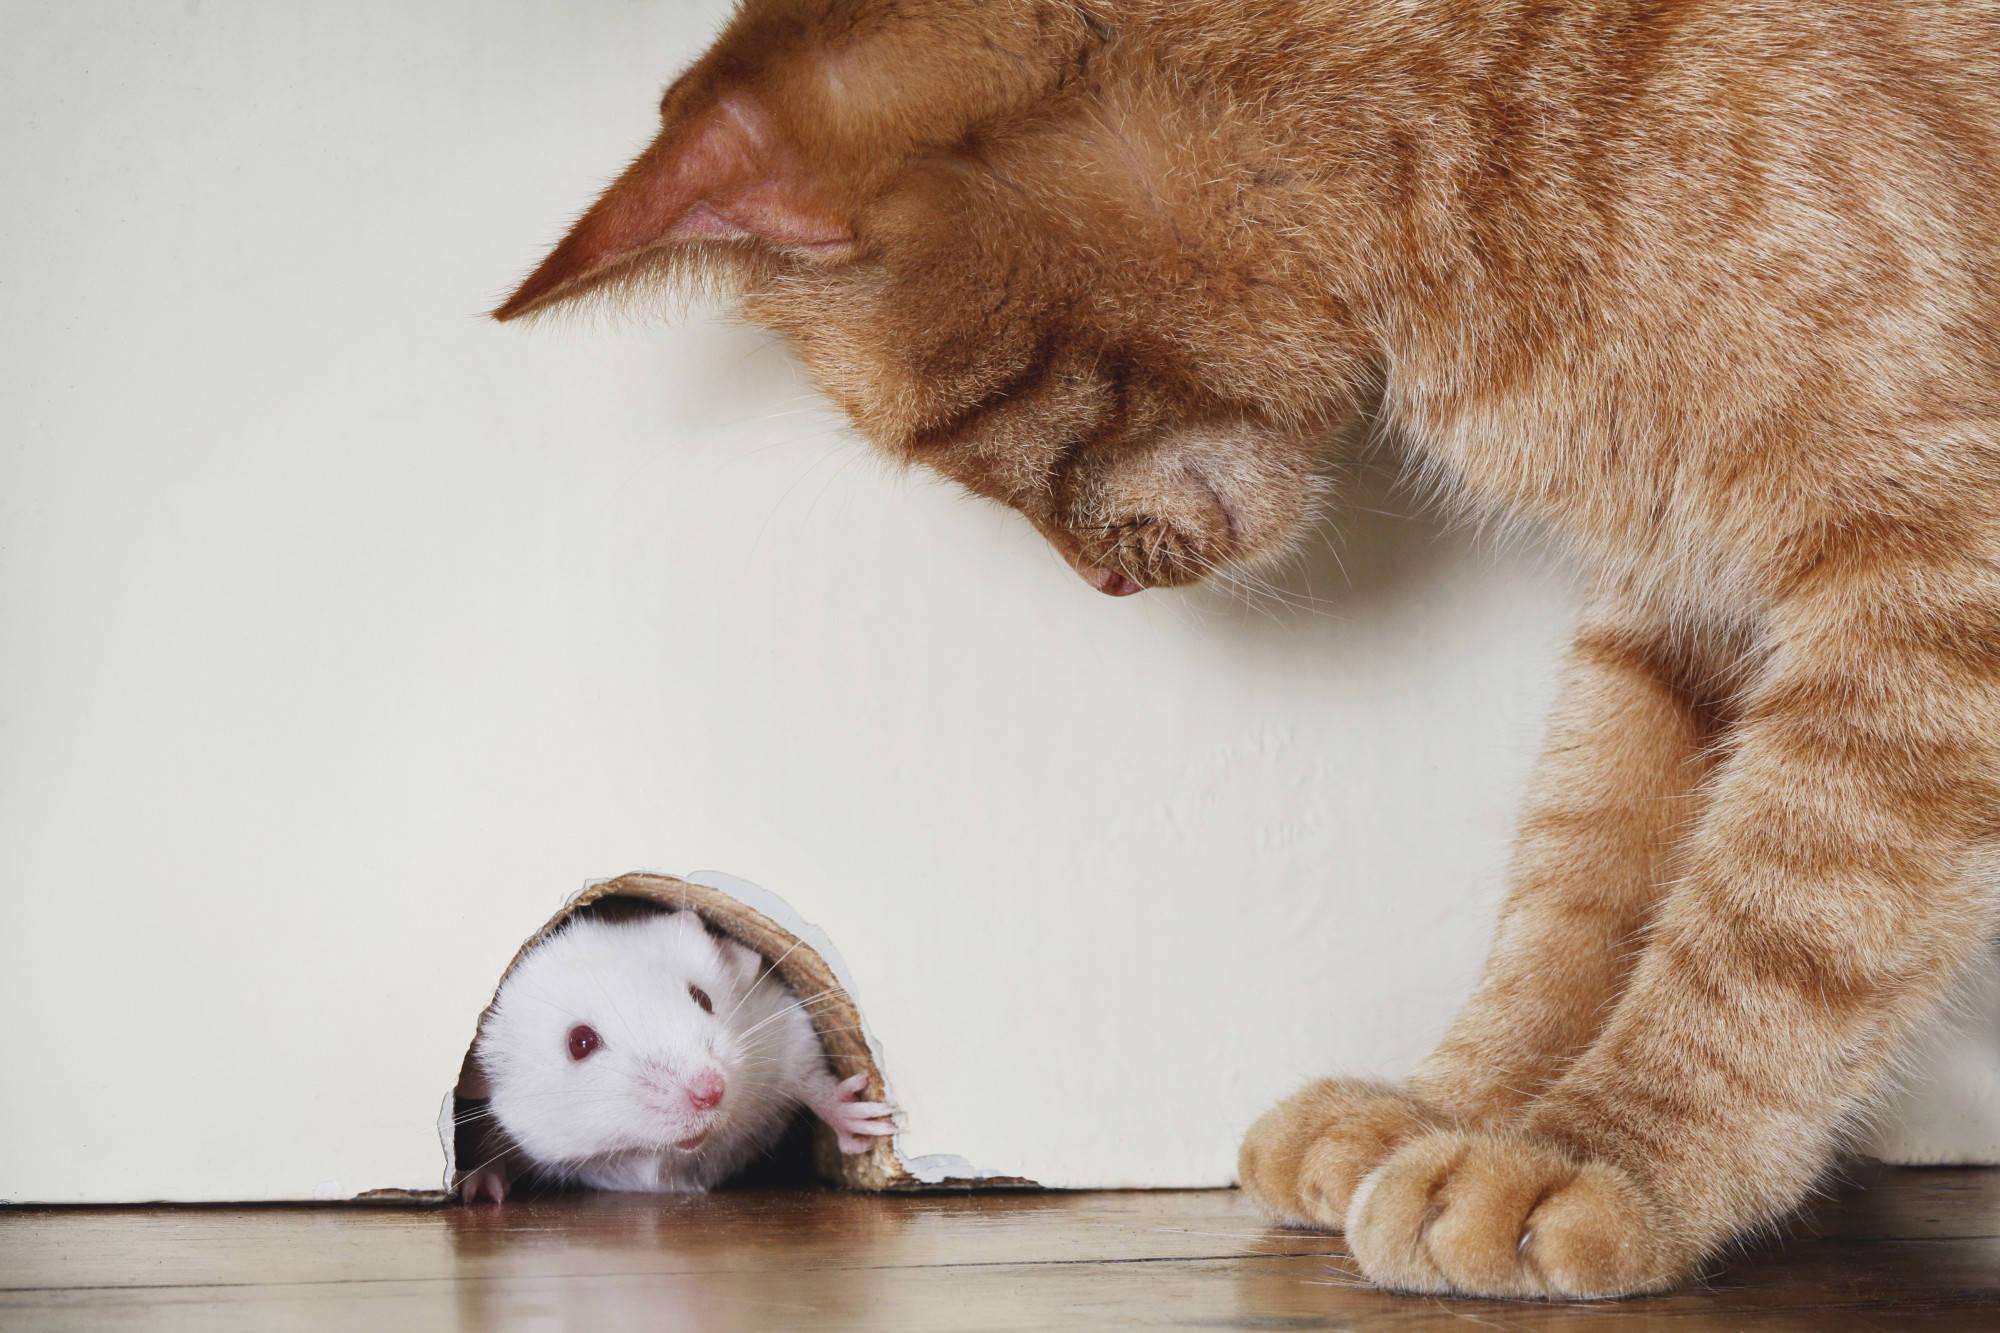 люди подбирают картинки про кошку и мышку нужно